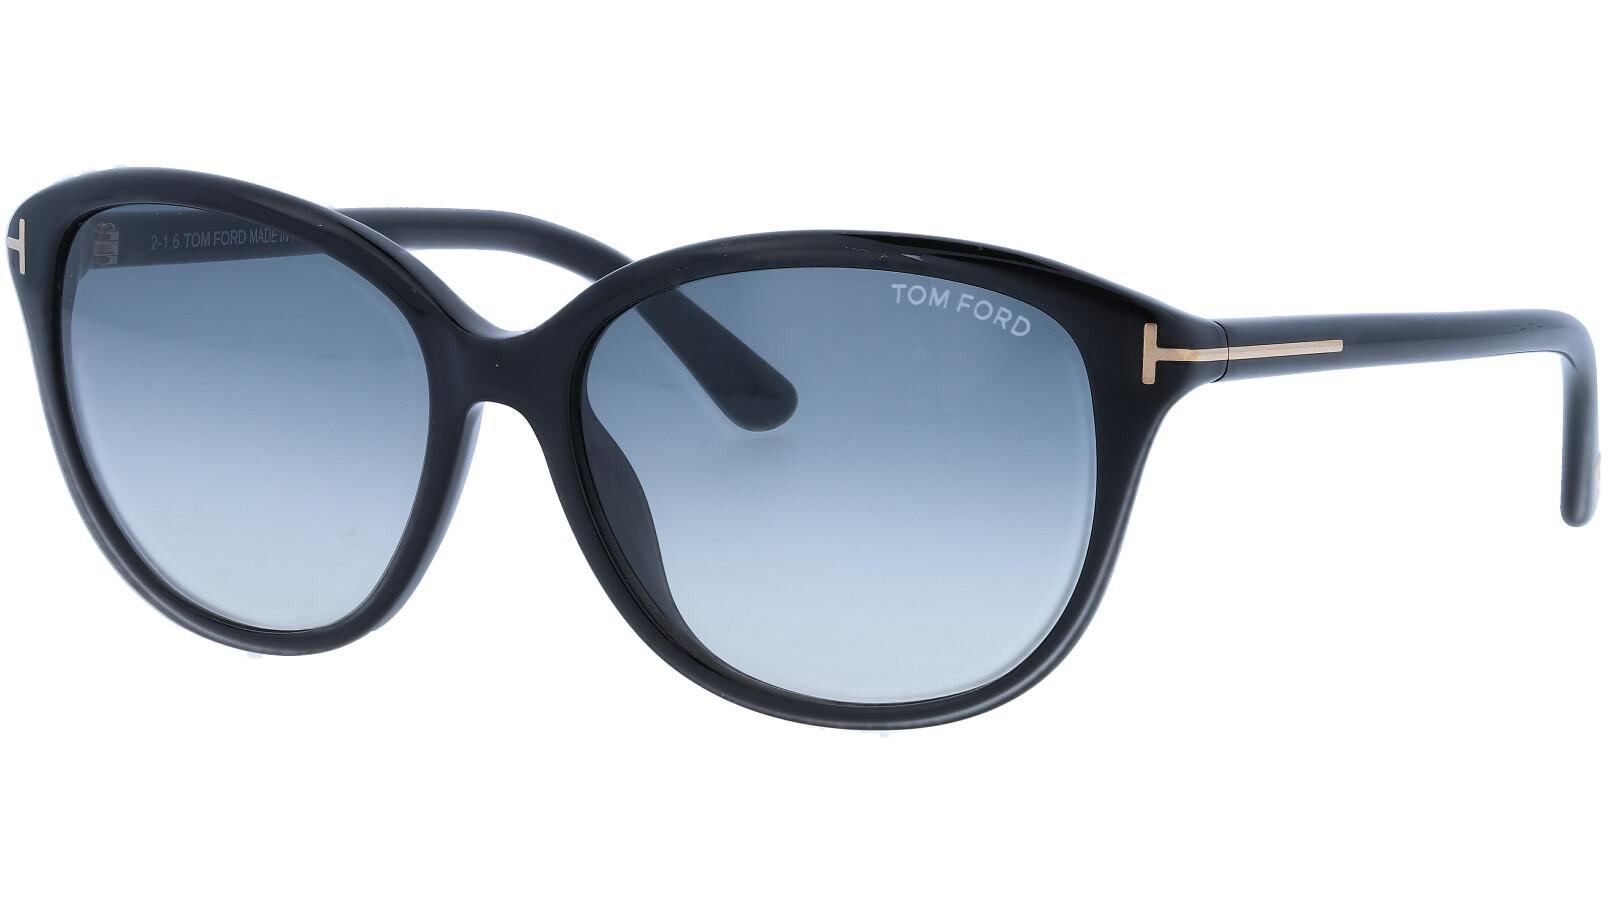 Tom Ford TF329 01B 57 Black Sunglasses